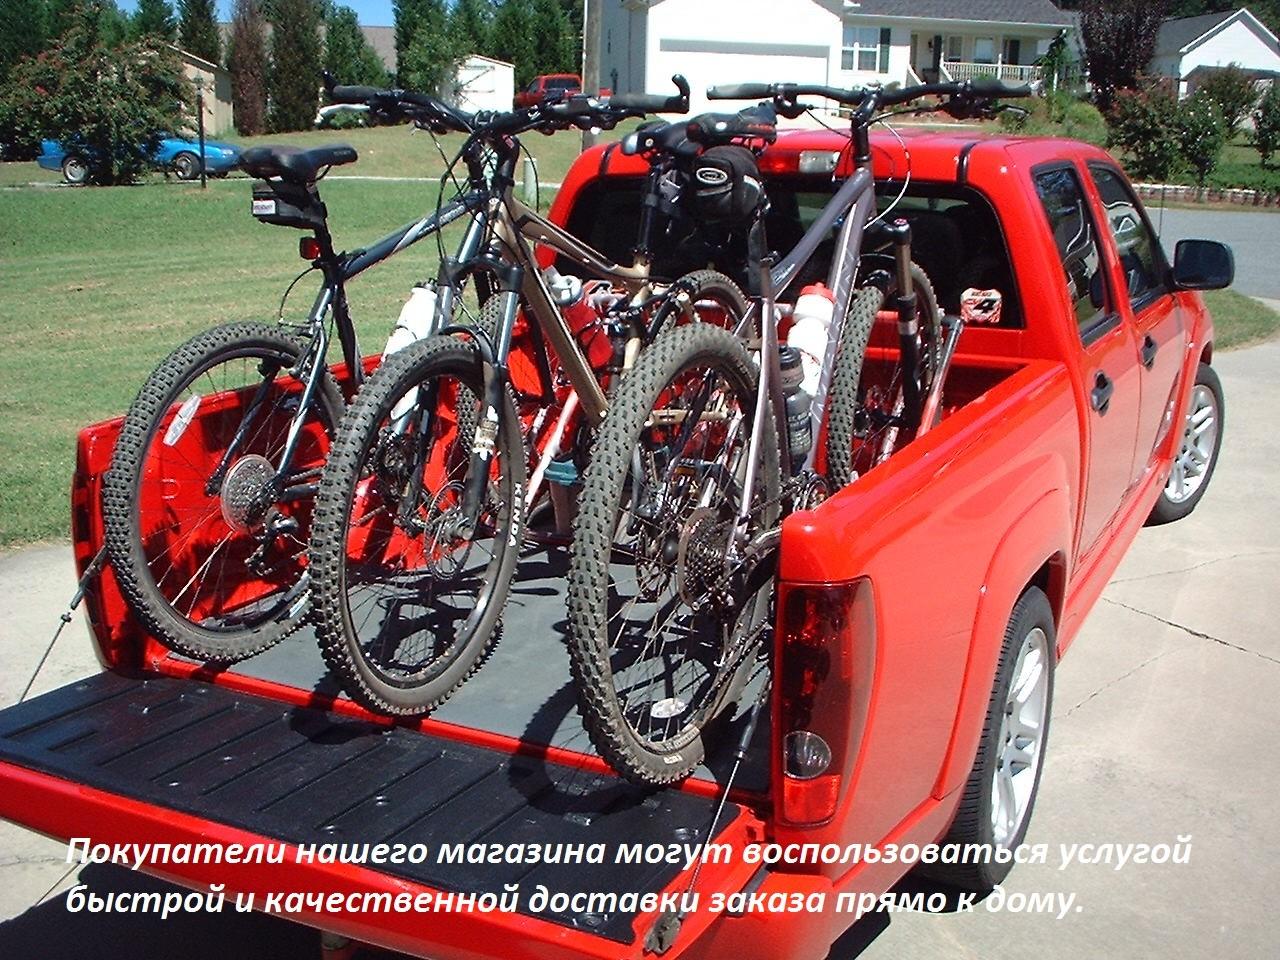 pipeline-truck-bed-bike-rack-motorcycle-review-and-galleries-pipeline-truck-bed-bike-rack-l-9fb03576a0422efd